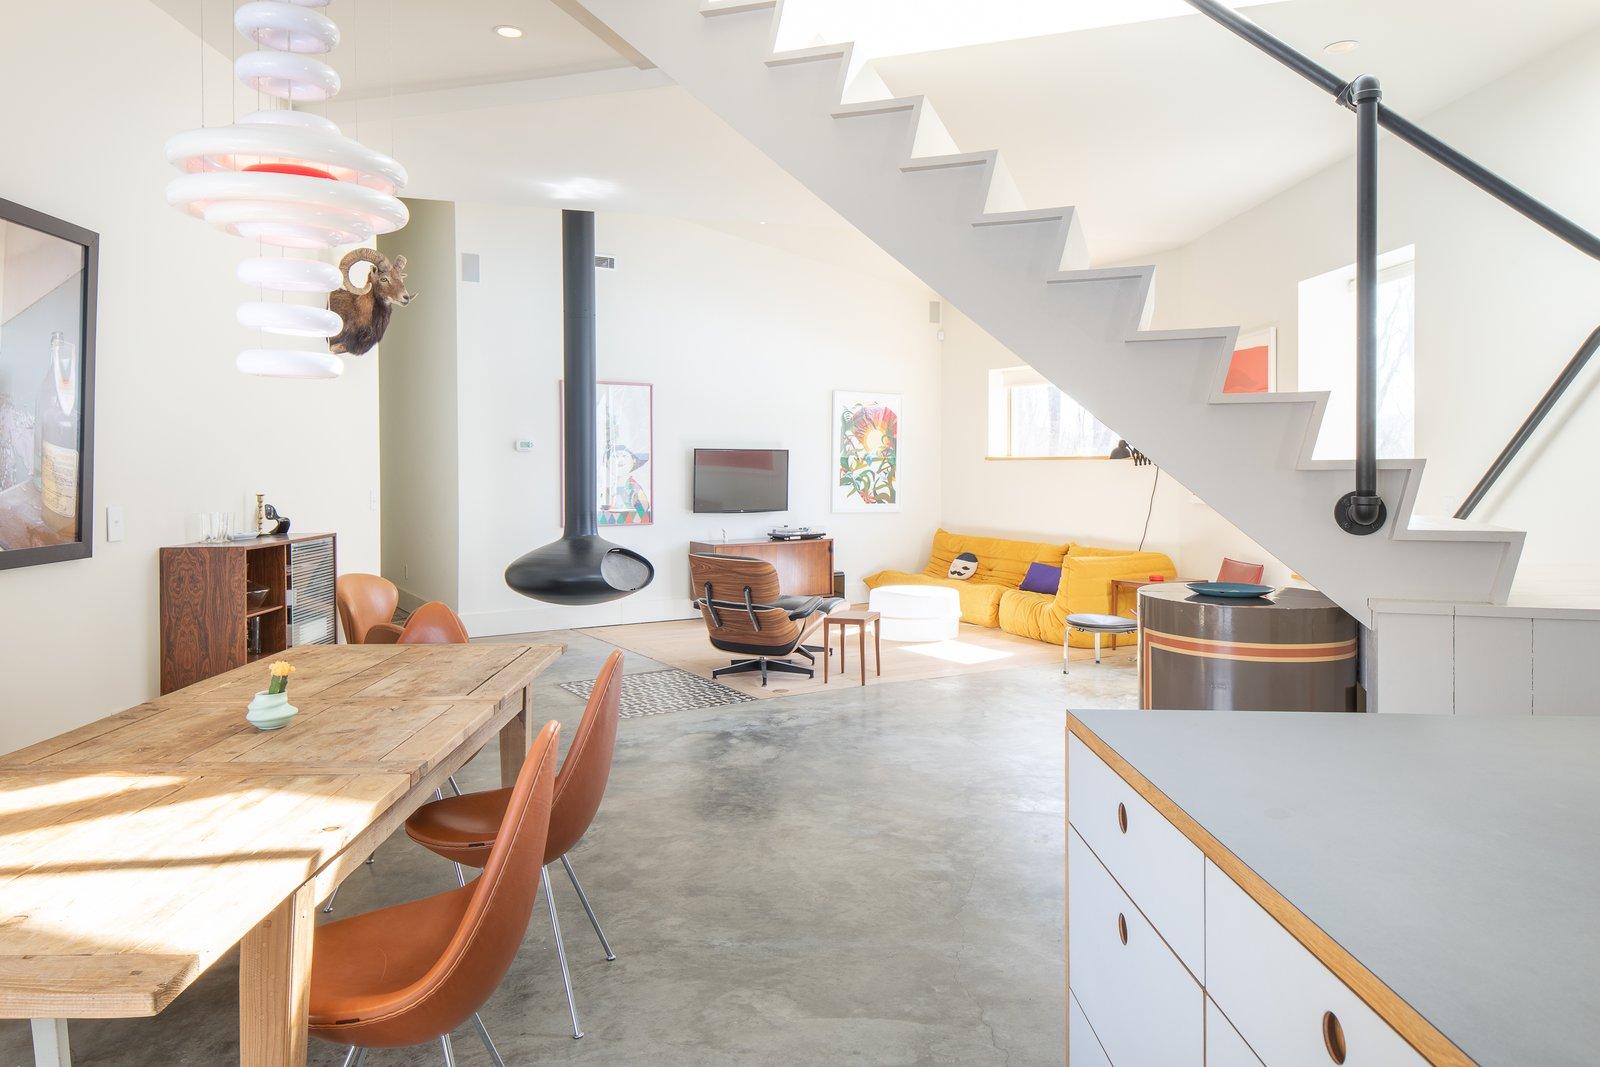 Grzywinski + Pons Farmhouse interior